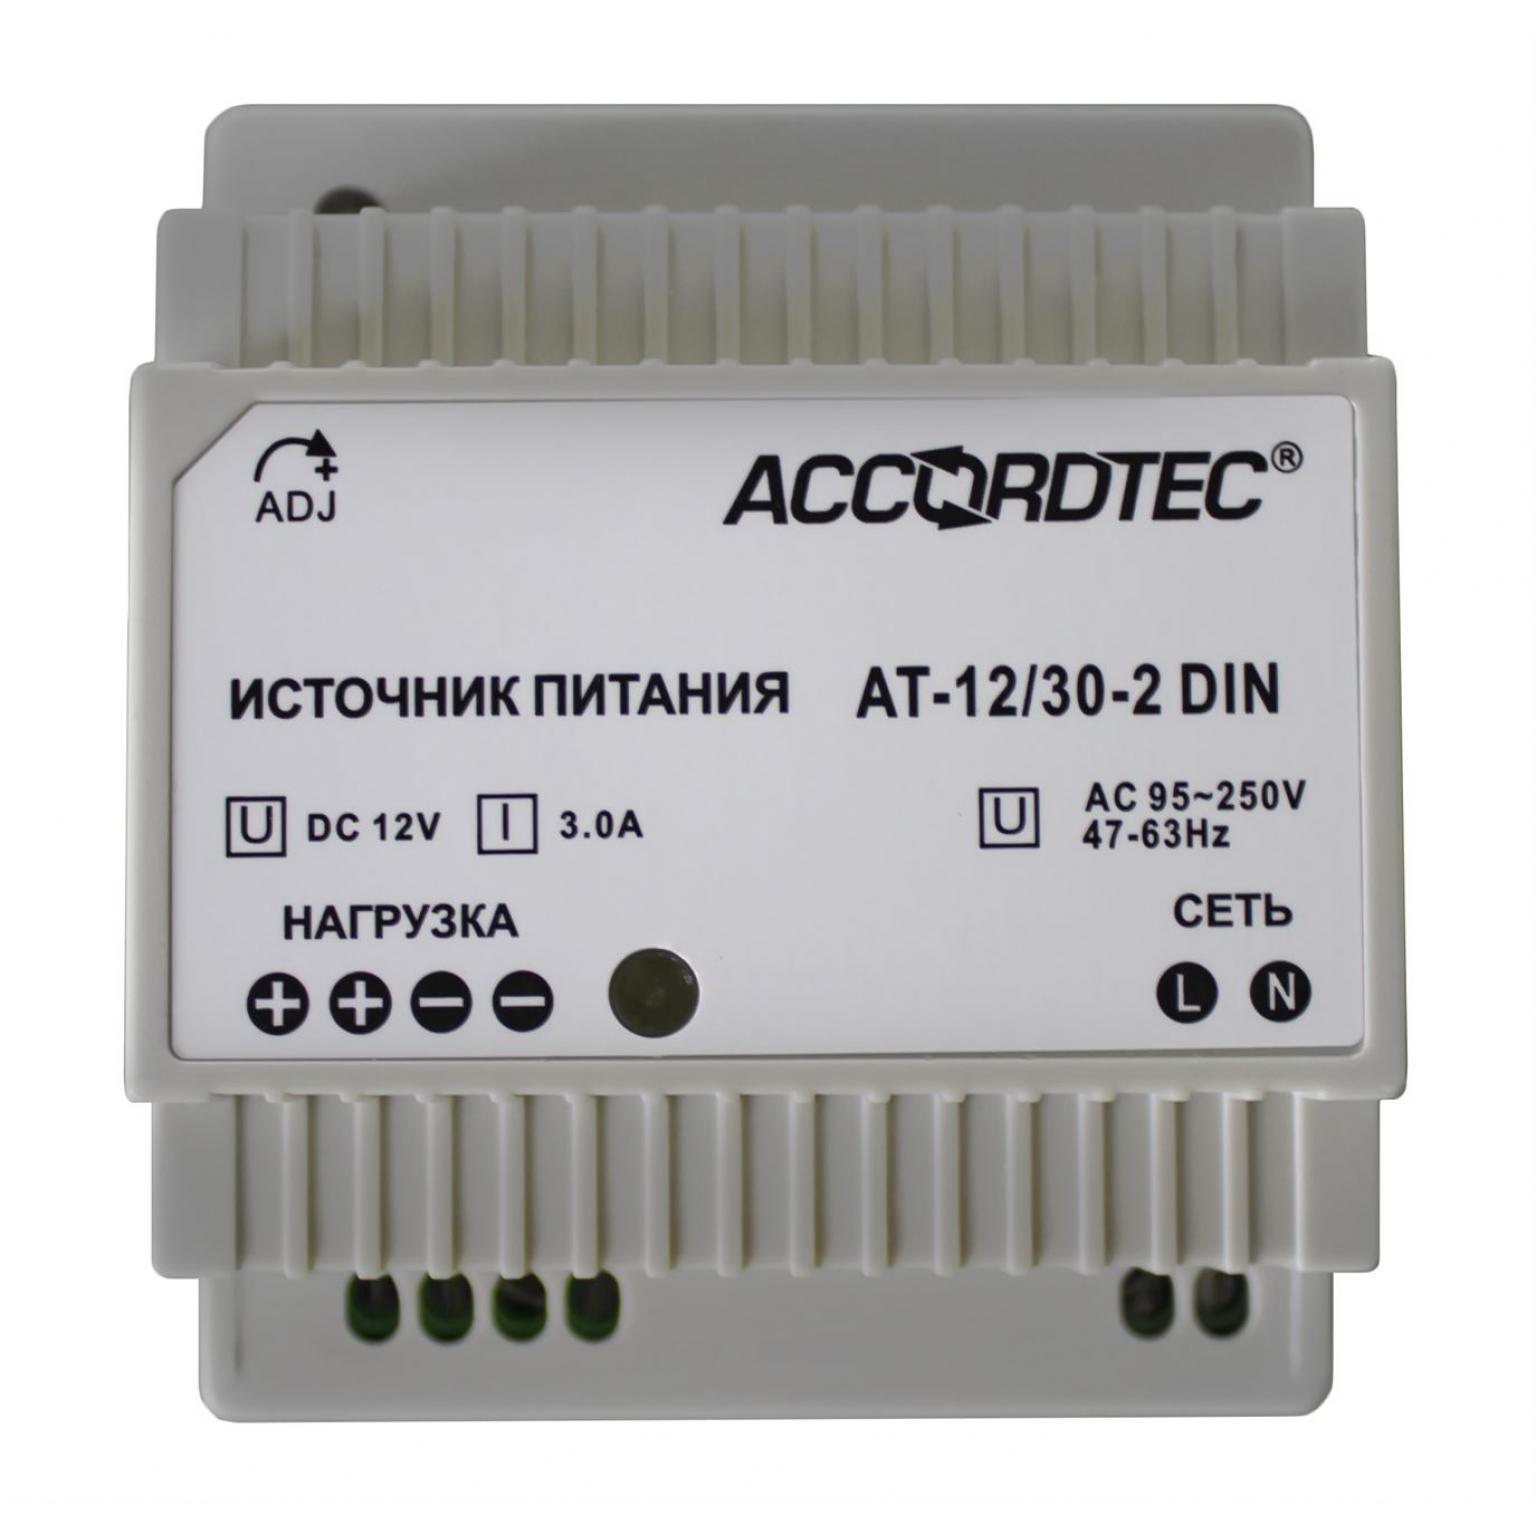 AT-1230-2 DIN